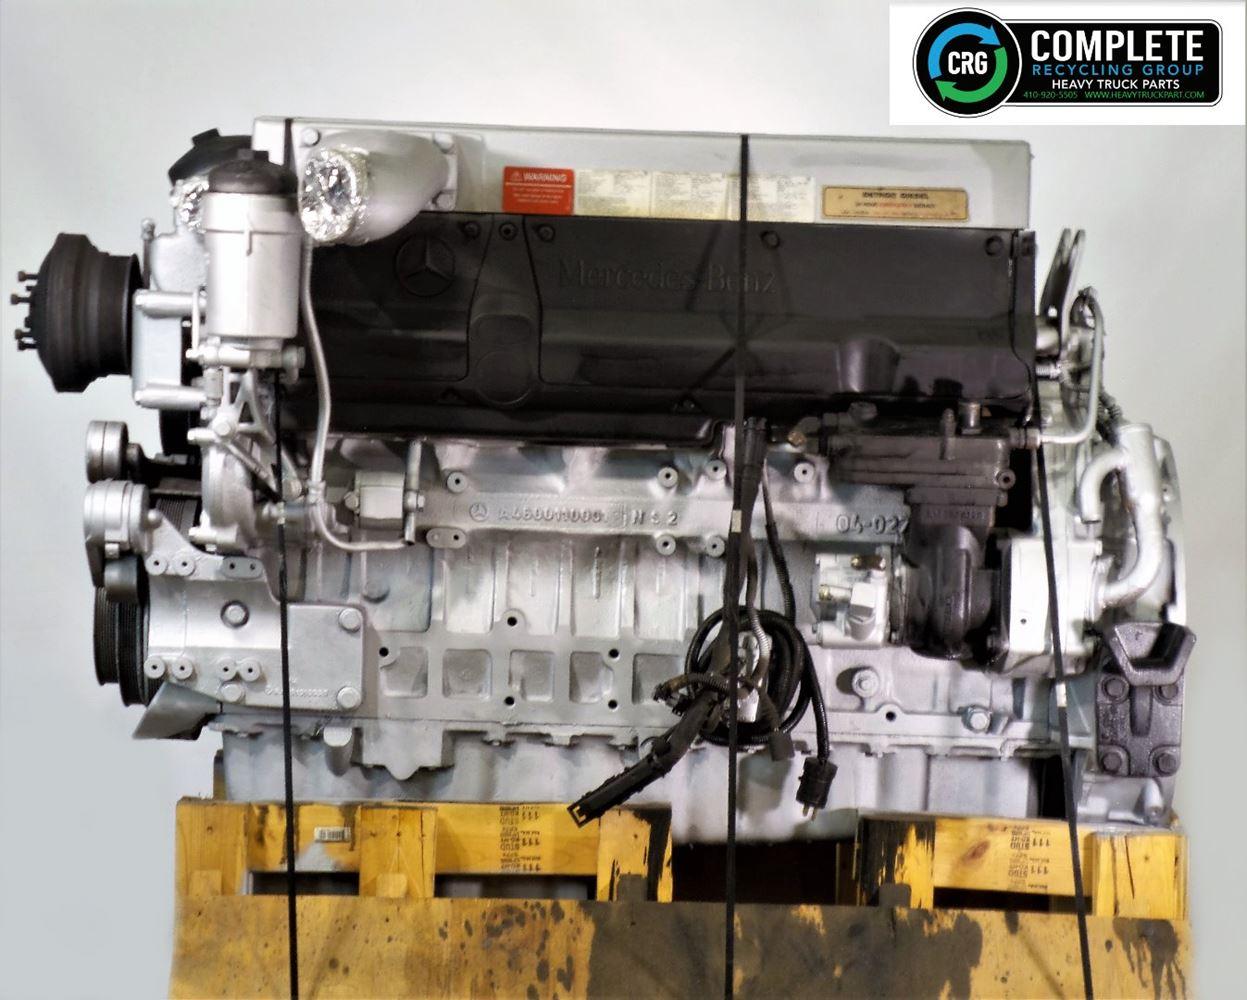 2004 MERCEDES OM 460 LA ENGINE ASSEMBLY TRUCK PARTS #679824